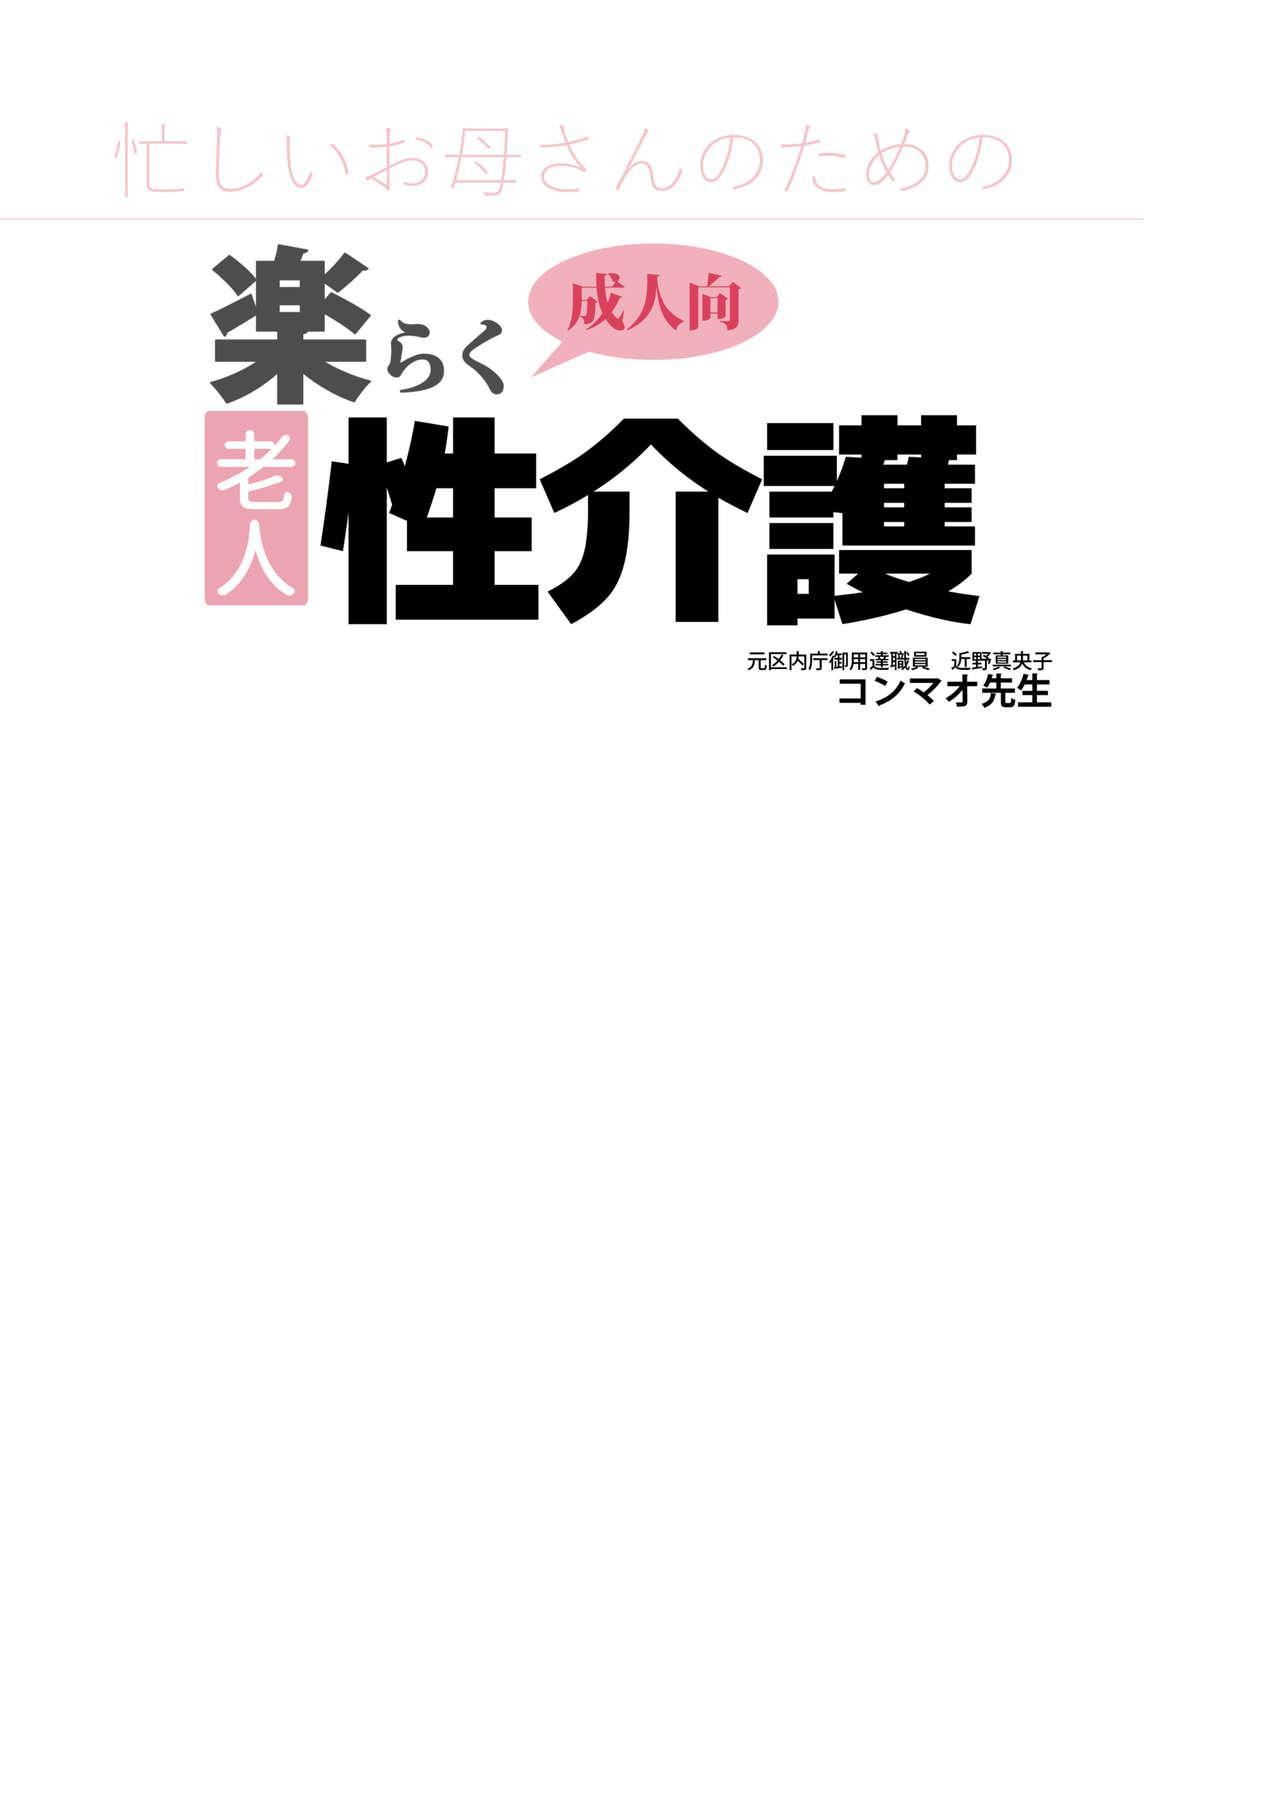 Isogasii Okaasan No Tamuno Sasa Rouzin Seikaigo | Guide for Elderly Sex Health Care to Busy Mom 2